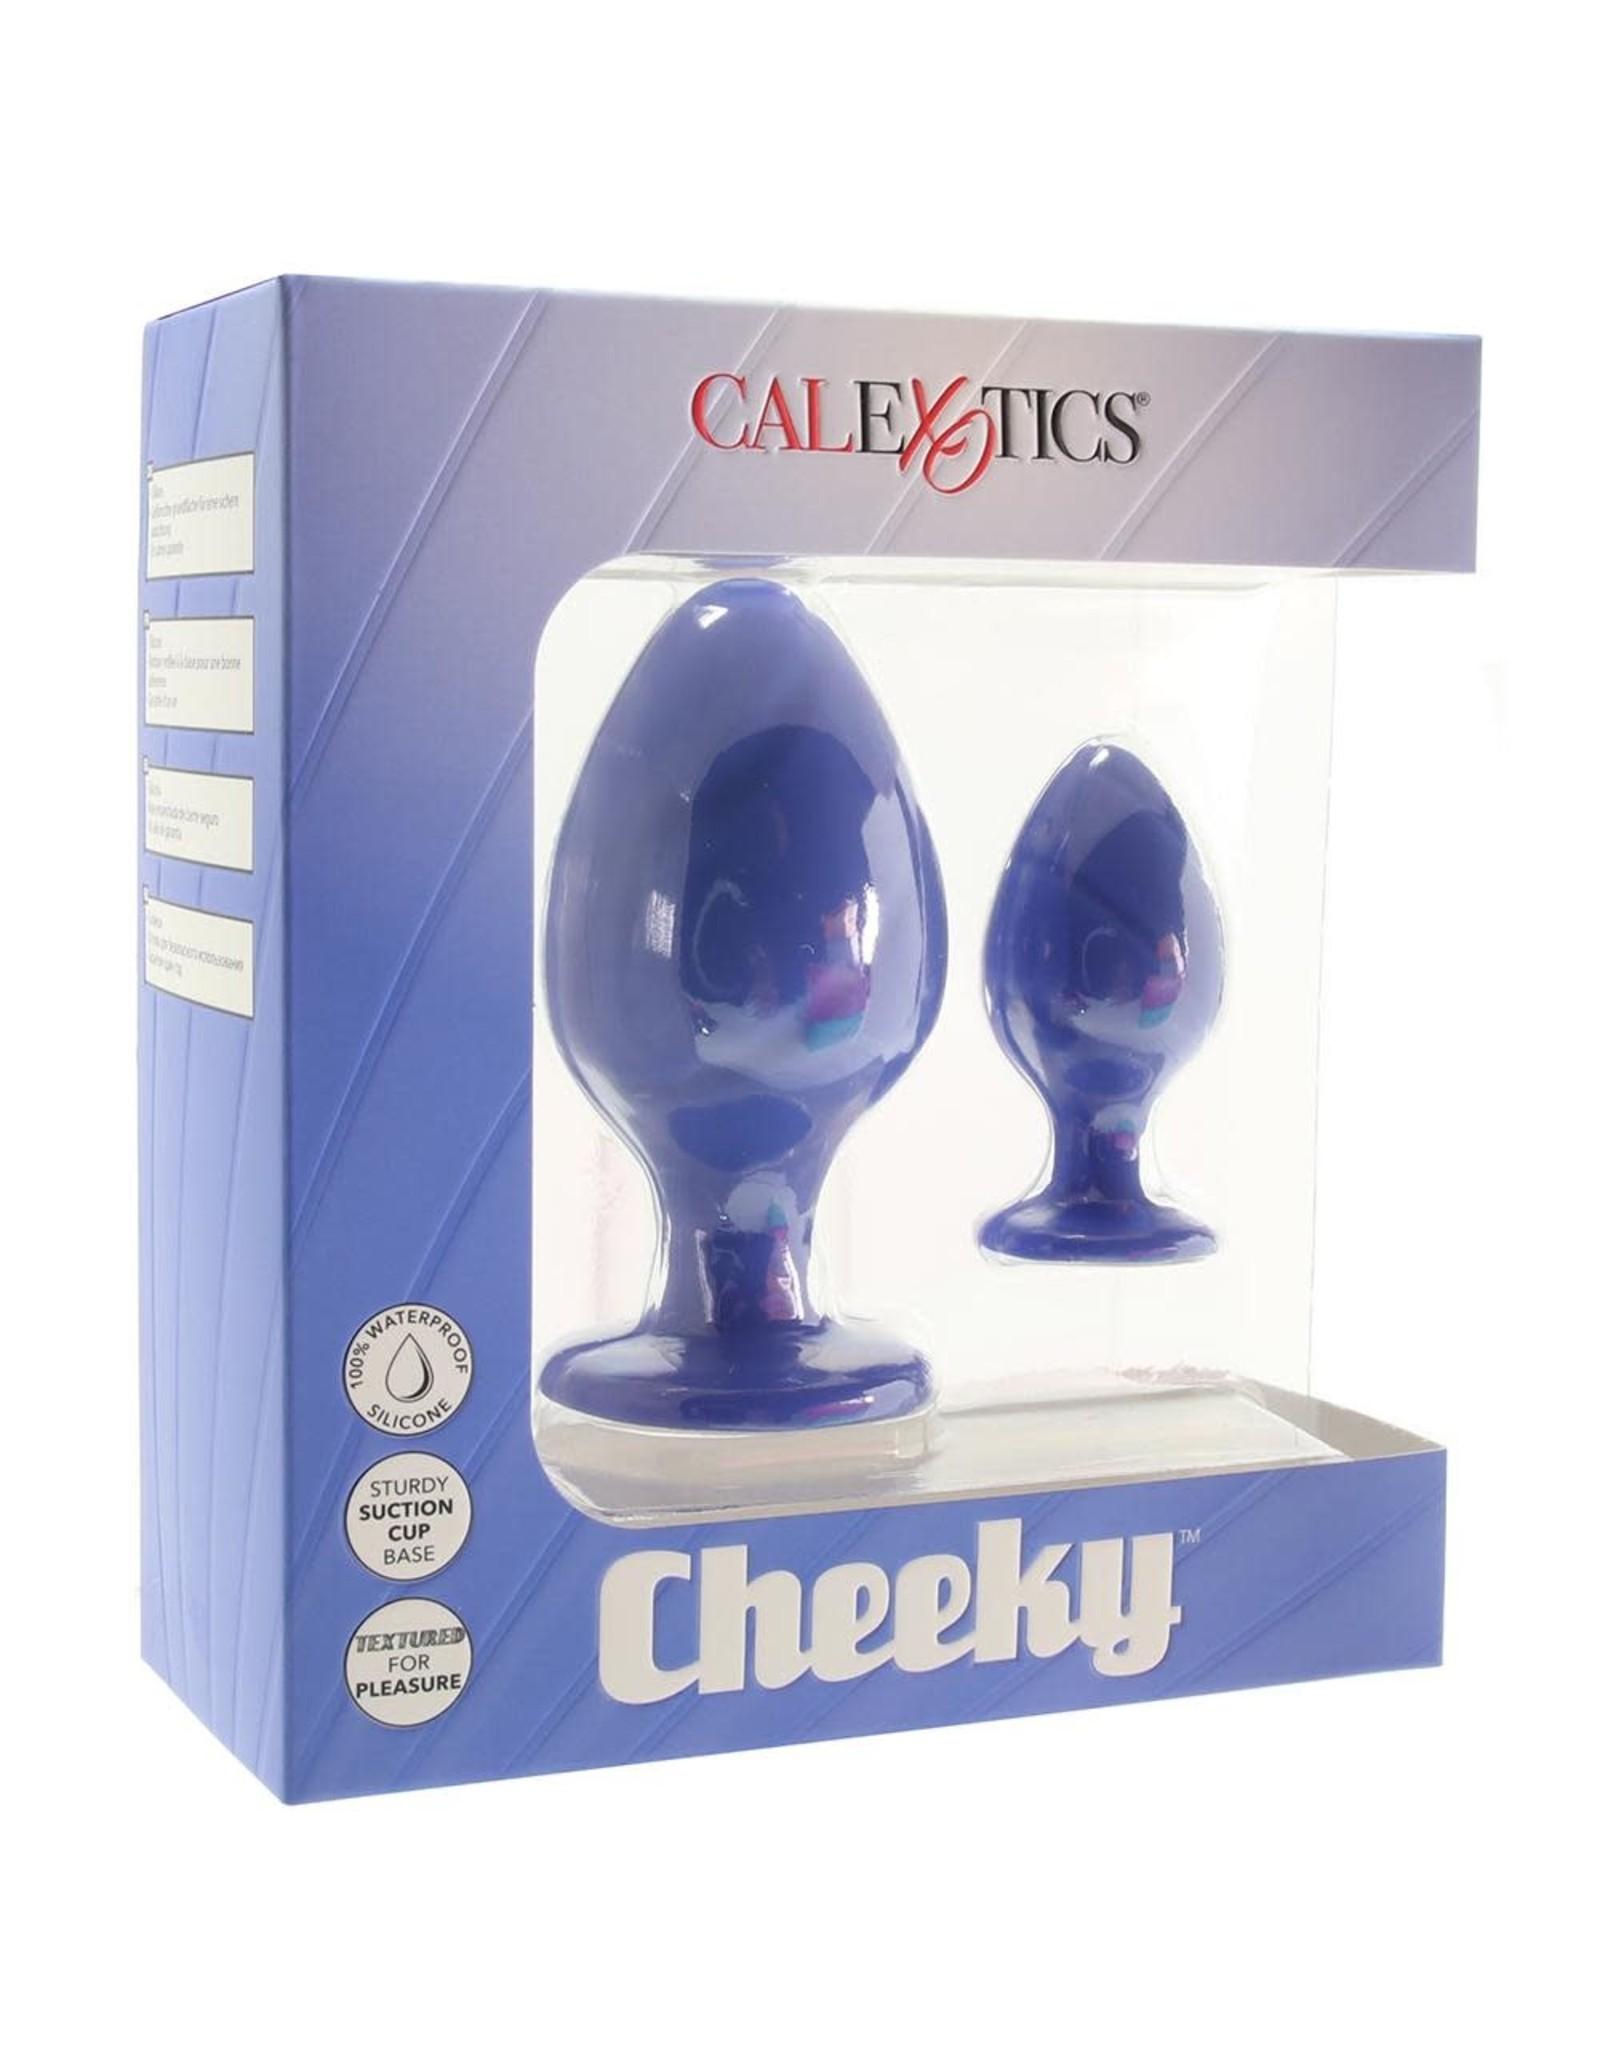 Calexotics Calexotics - Cheeky Butt Plug Set (blue)